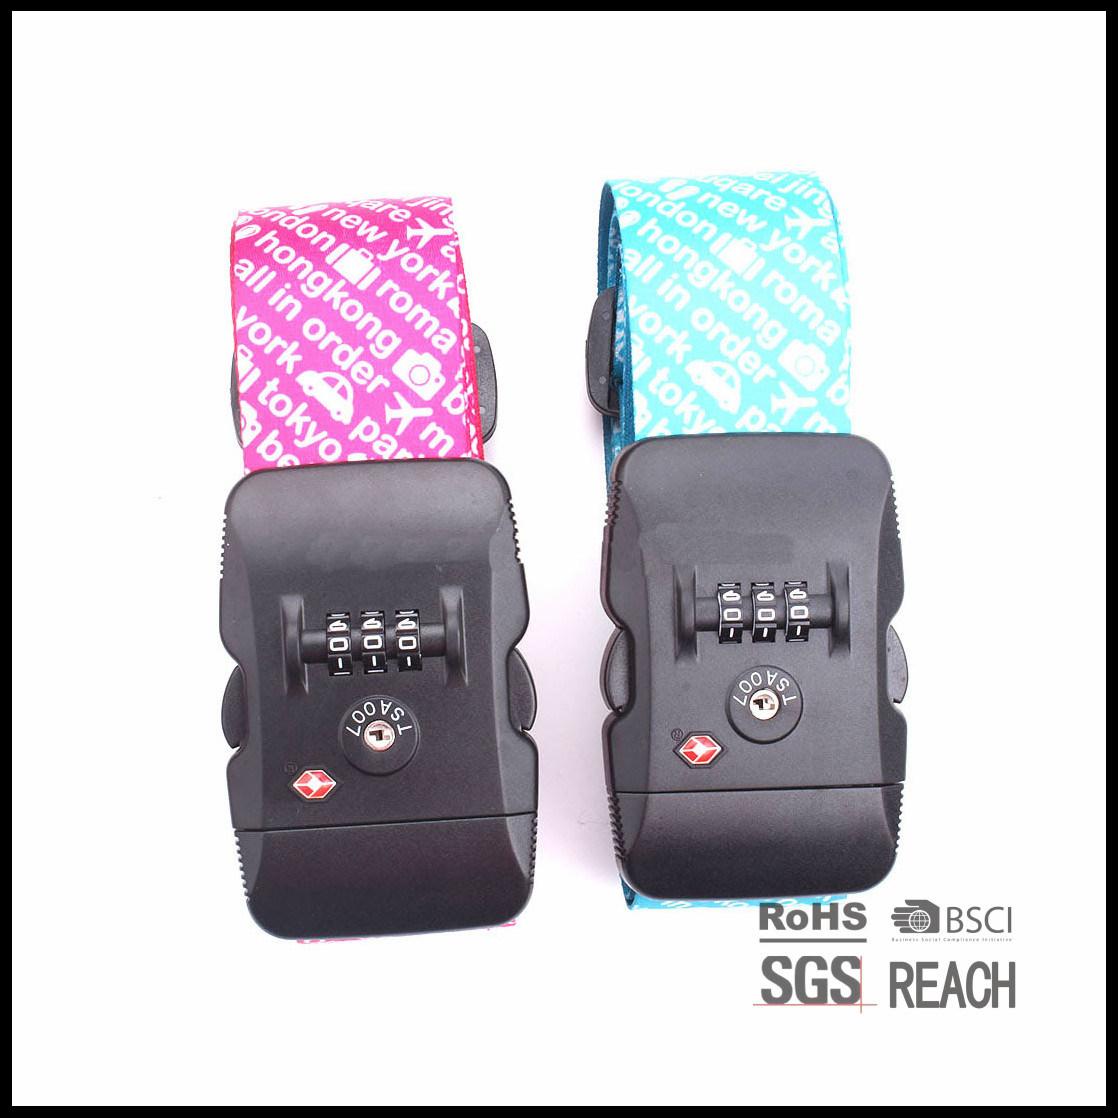 Heavy Duty Extra Long Luggage Strap with Tsa Approved Lock Reflex Belt Suitcase Luggage